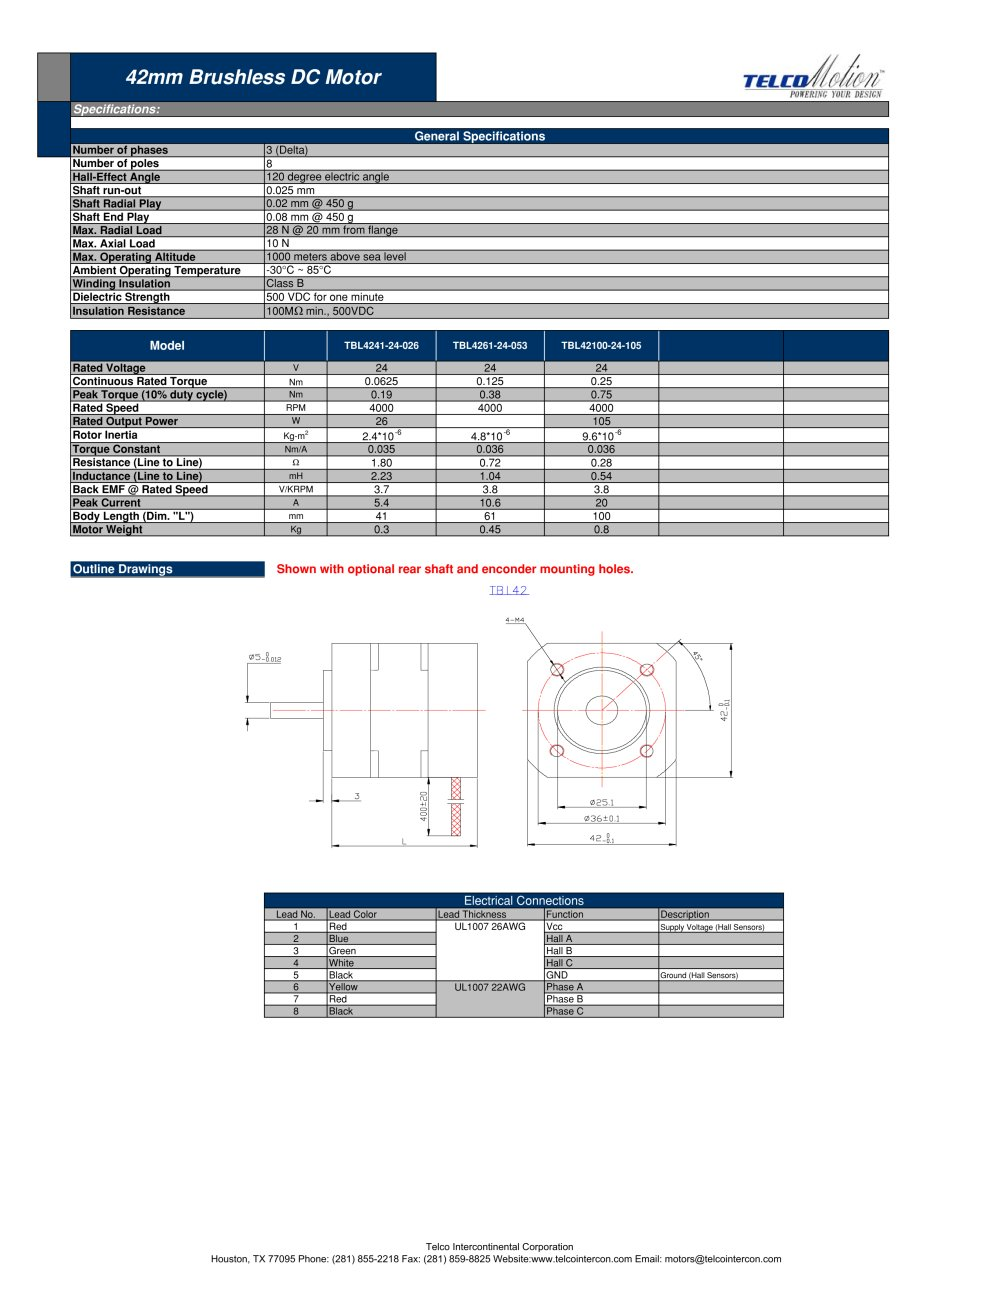 Brushless Dc Motor Operation Pdf Pole Winding Diagram 4 Nema Catalog Telco Catalogue Technical